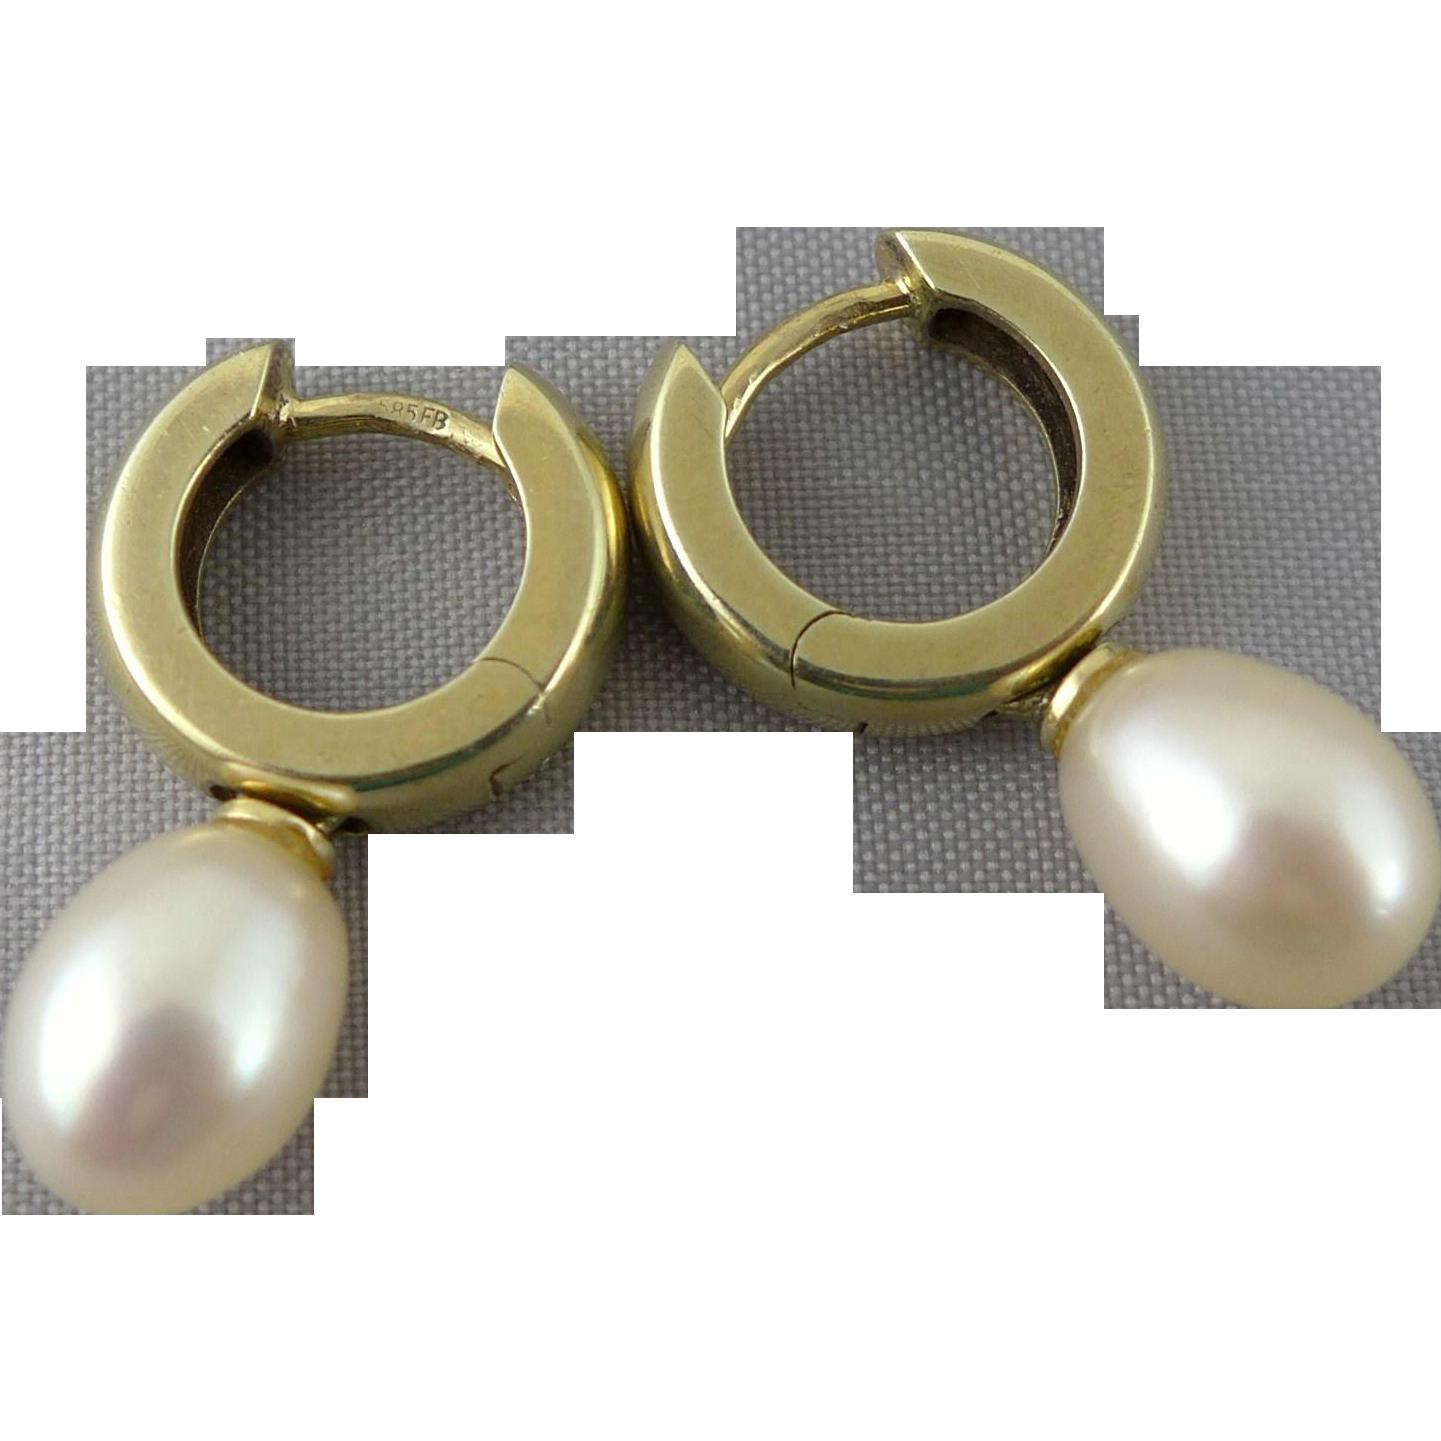 Vintage European 14K Gold Huggie Earrings With Pearl, Signed 585 FB